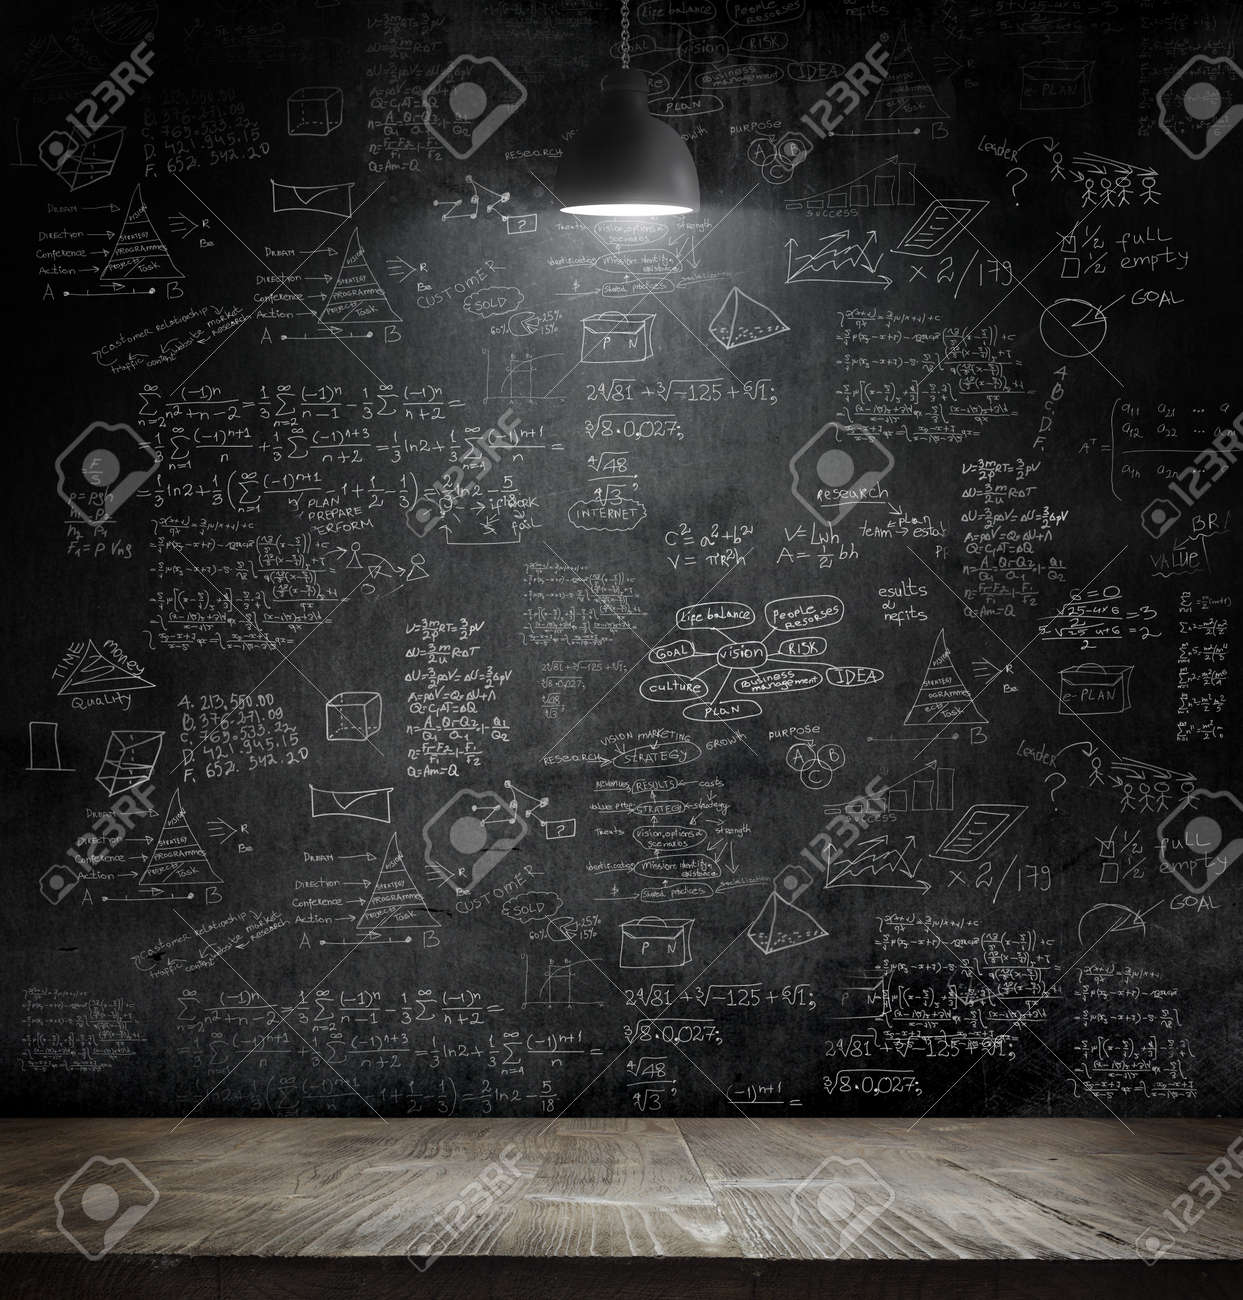 business idea concept on wall backboard blackground - 47259240